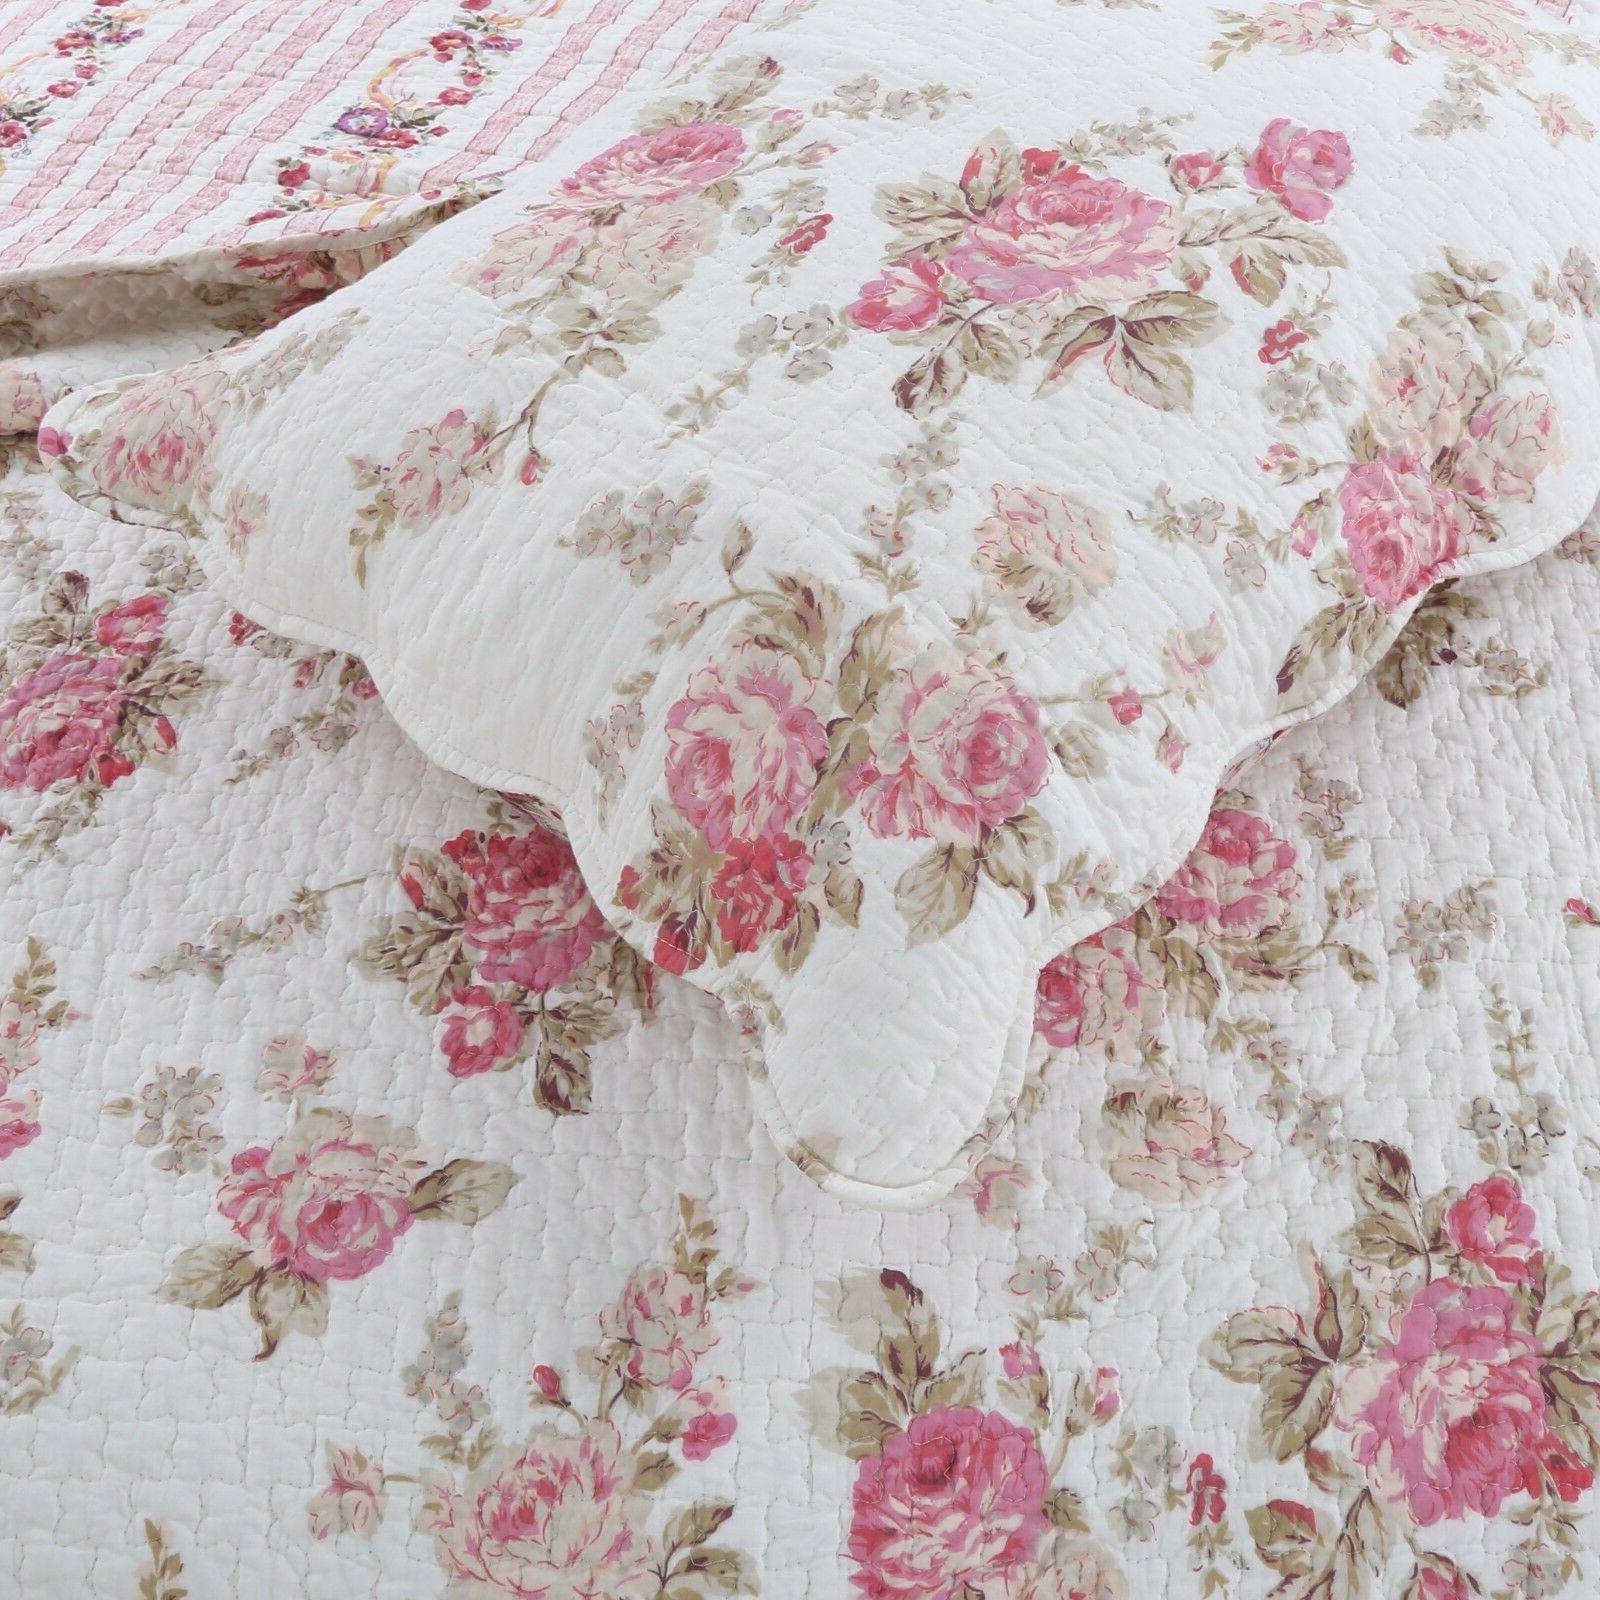 Spring Rose 100%Cotton 3-Piece Quilt Bedspread, Coverlet